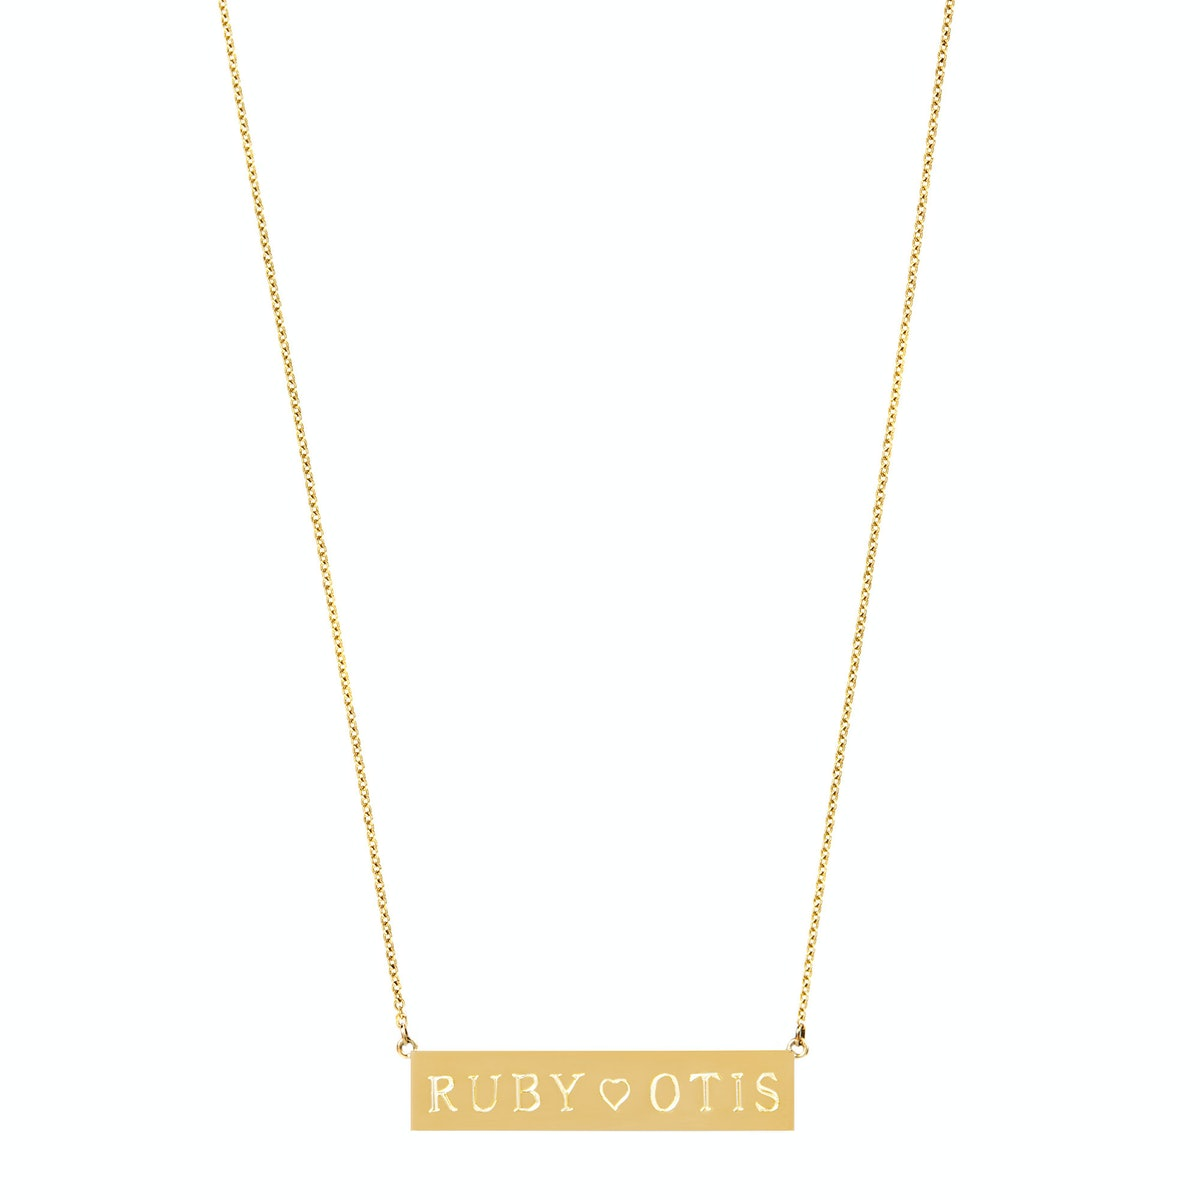 Jennifer Meyer 18k yellow gold personalized nameplate necklace